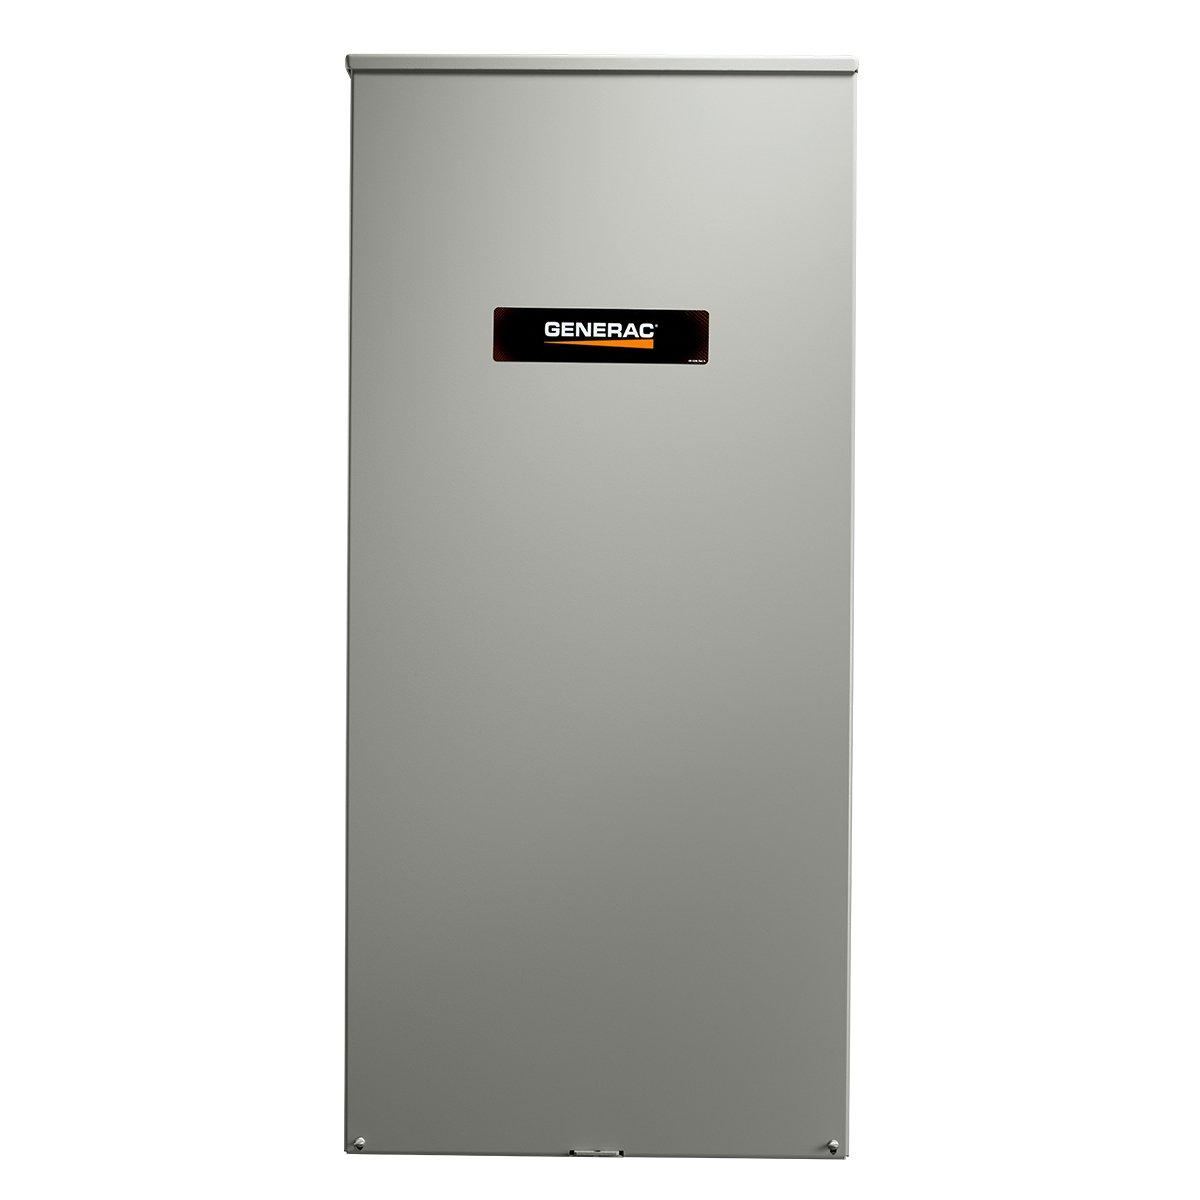 amazon.com: generac rxsw200a3 200 amp smart transfer switch: garden &  outdoor  amazon.com